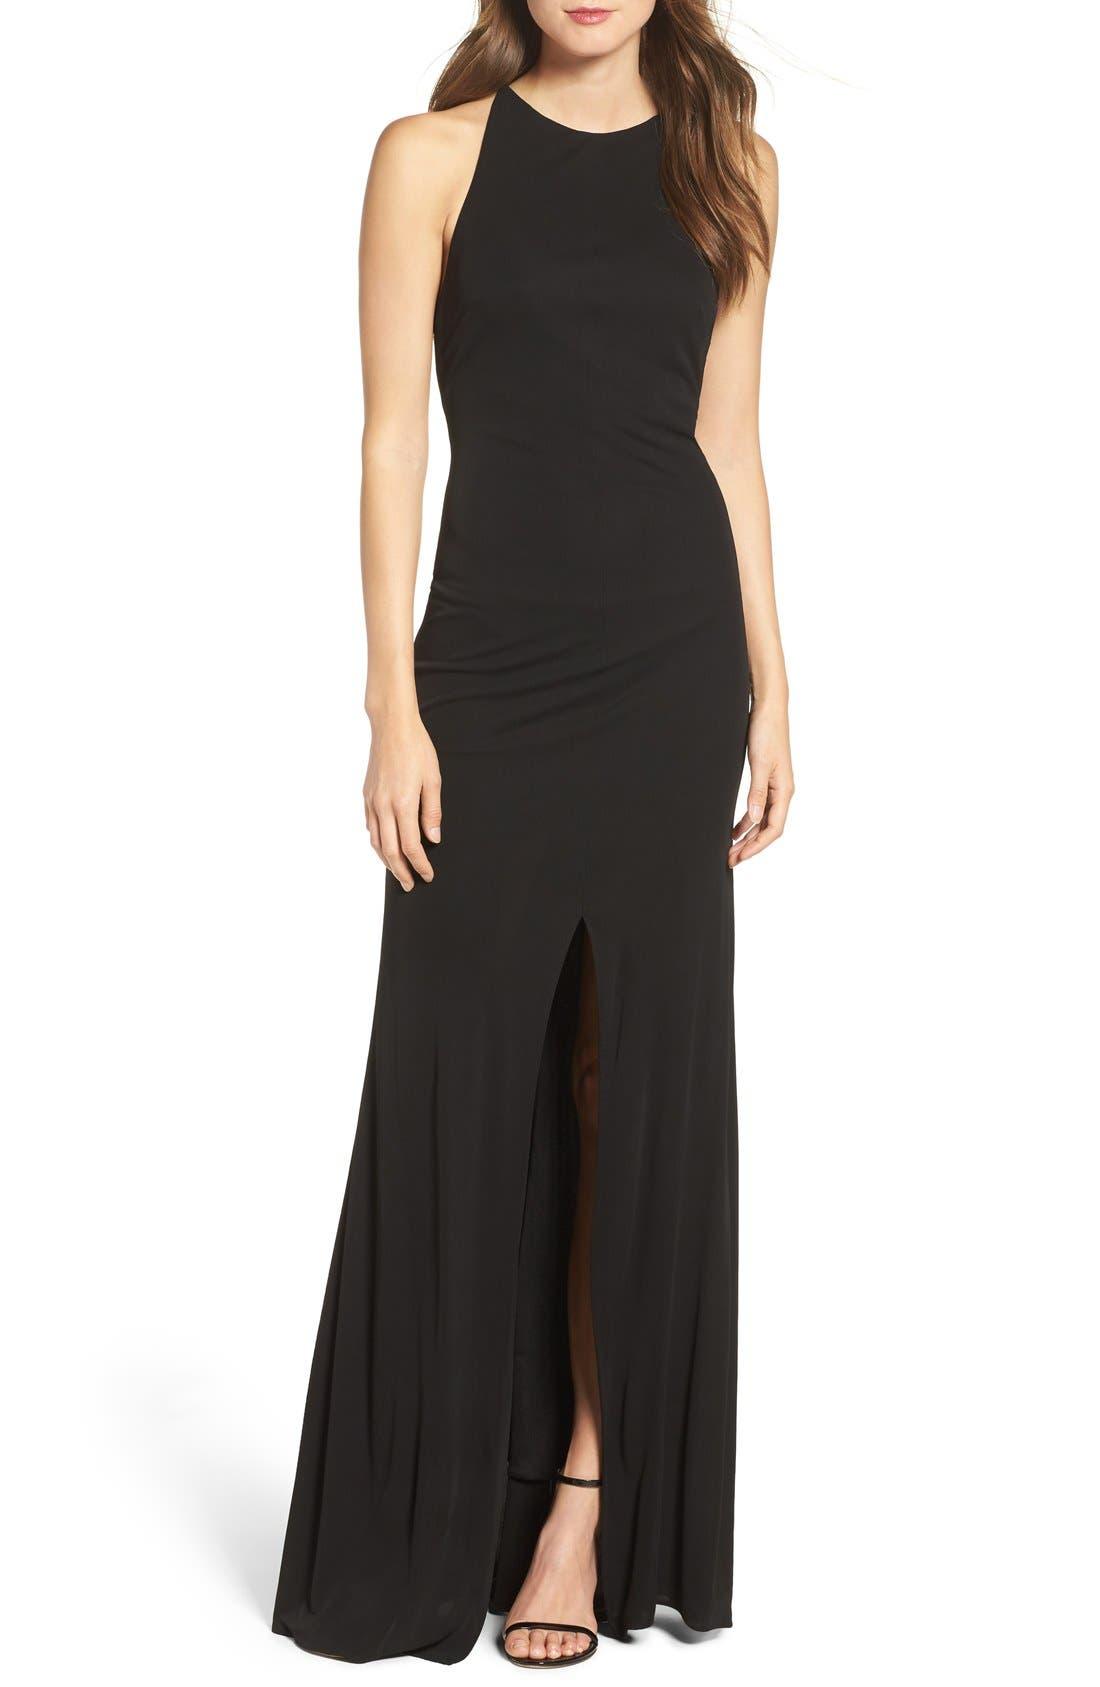 Alternate Image 1 Selected - Maria Bianca Nero Victoria Sleeveless Gown